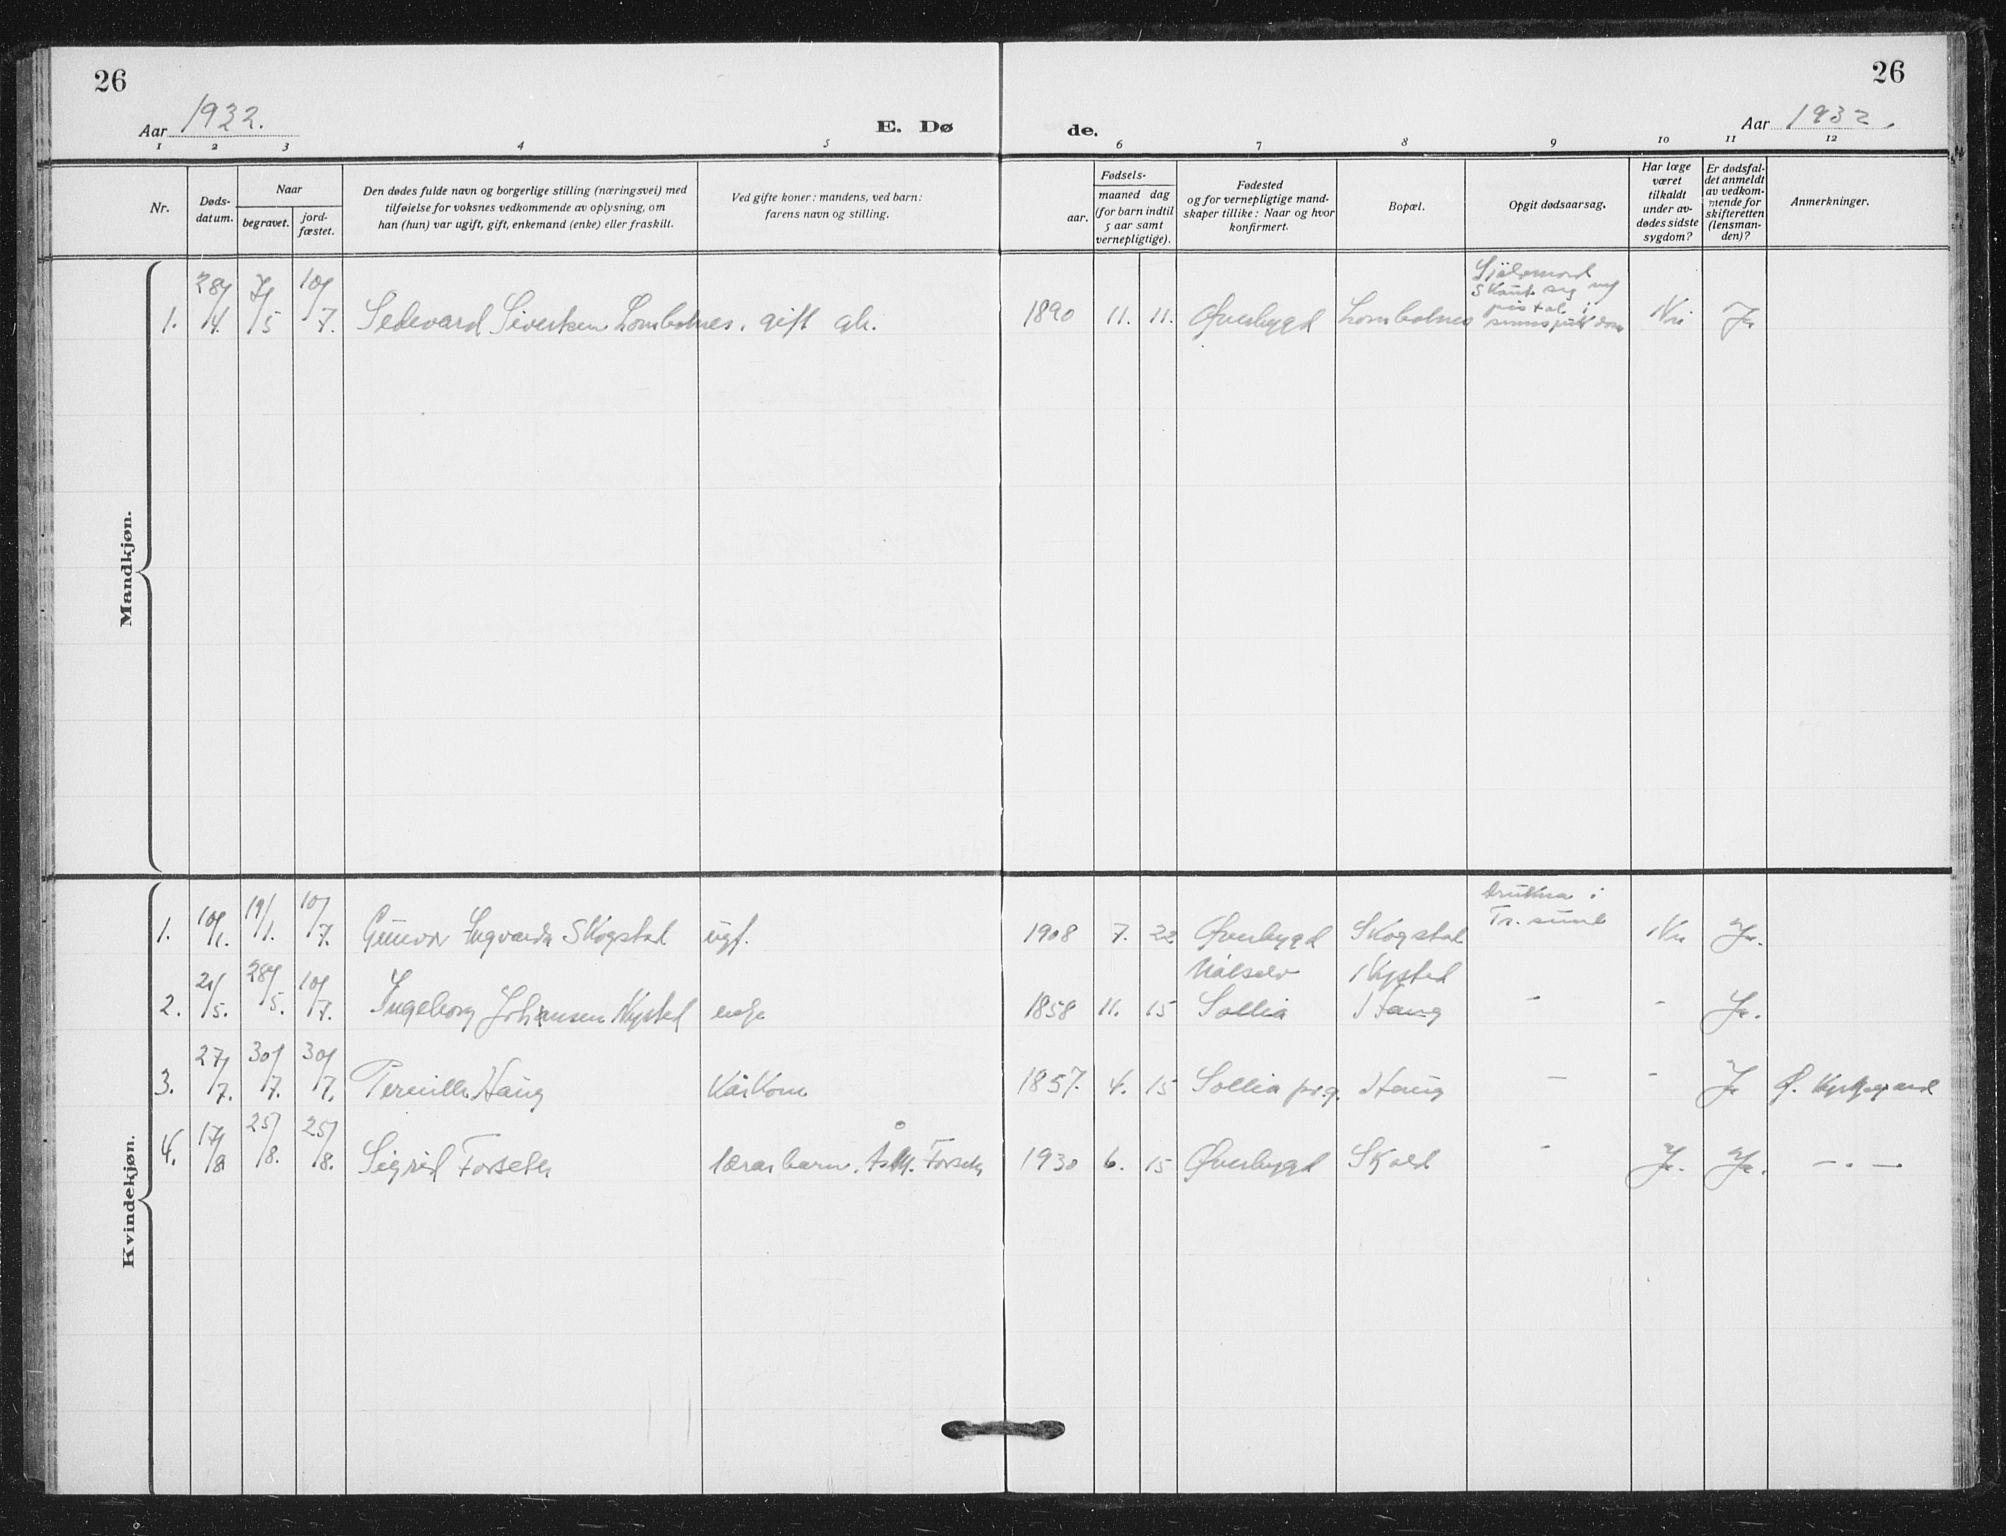 SATØ, Målselv sokneprestembete, G/Ga/Gab/L0012klokker: Klokkerbok nr. 12, 1900-1936, s. 26